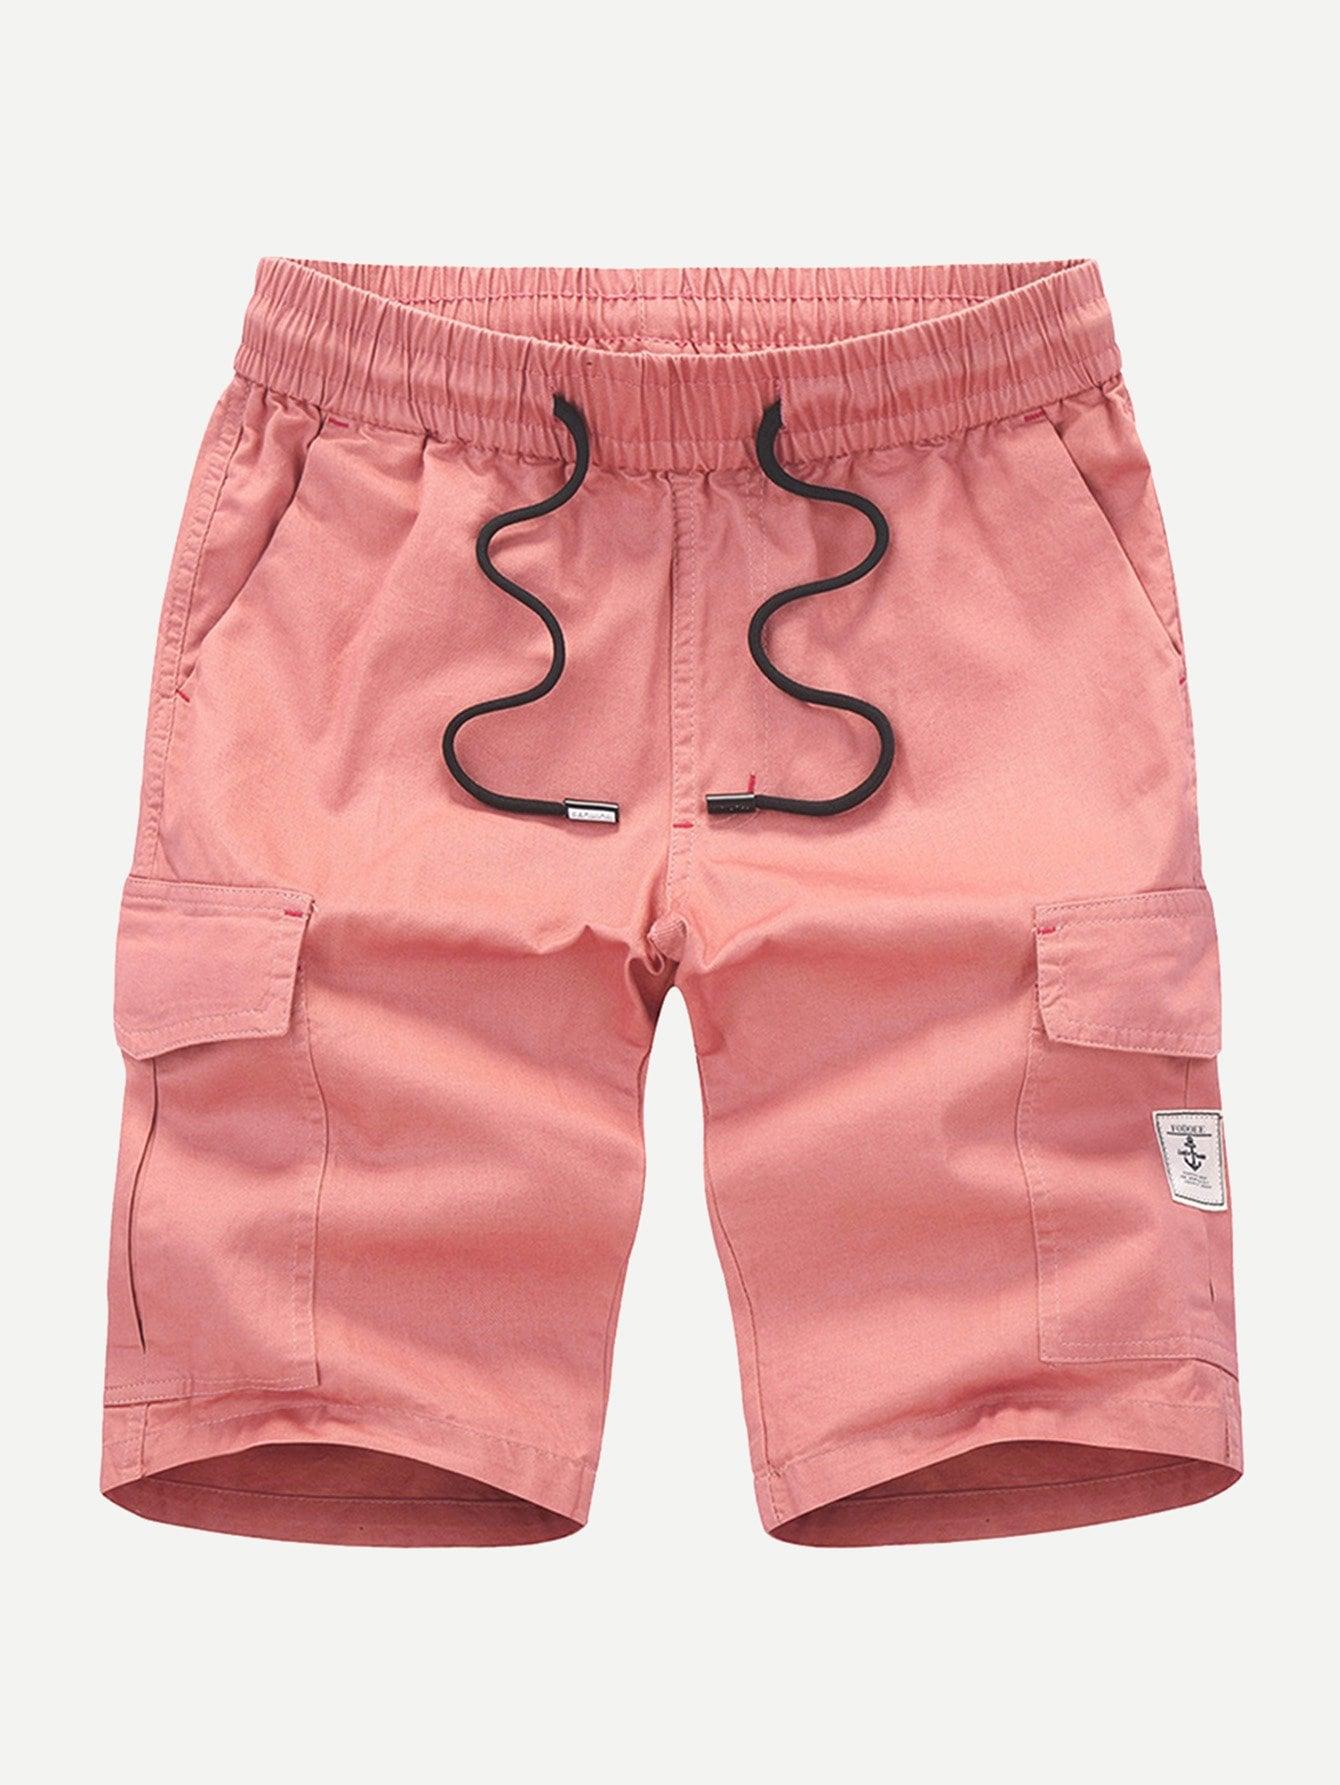 Men Pocket Decoration Plain Drawstring Shorts